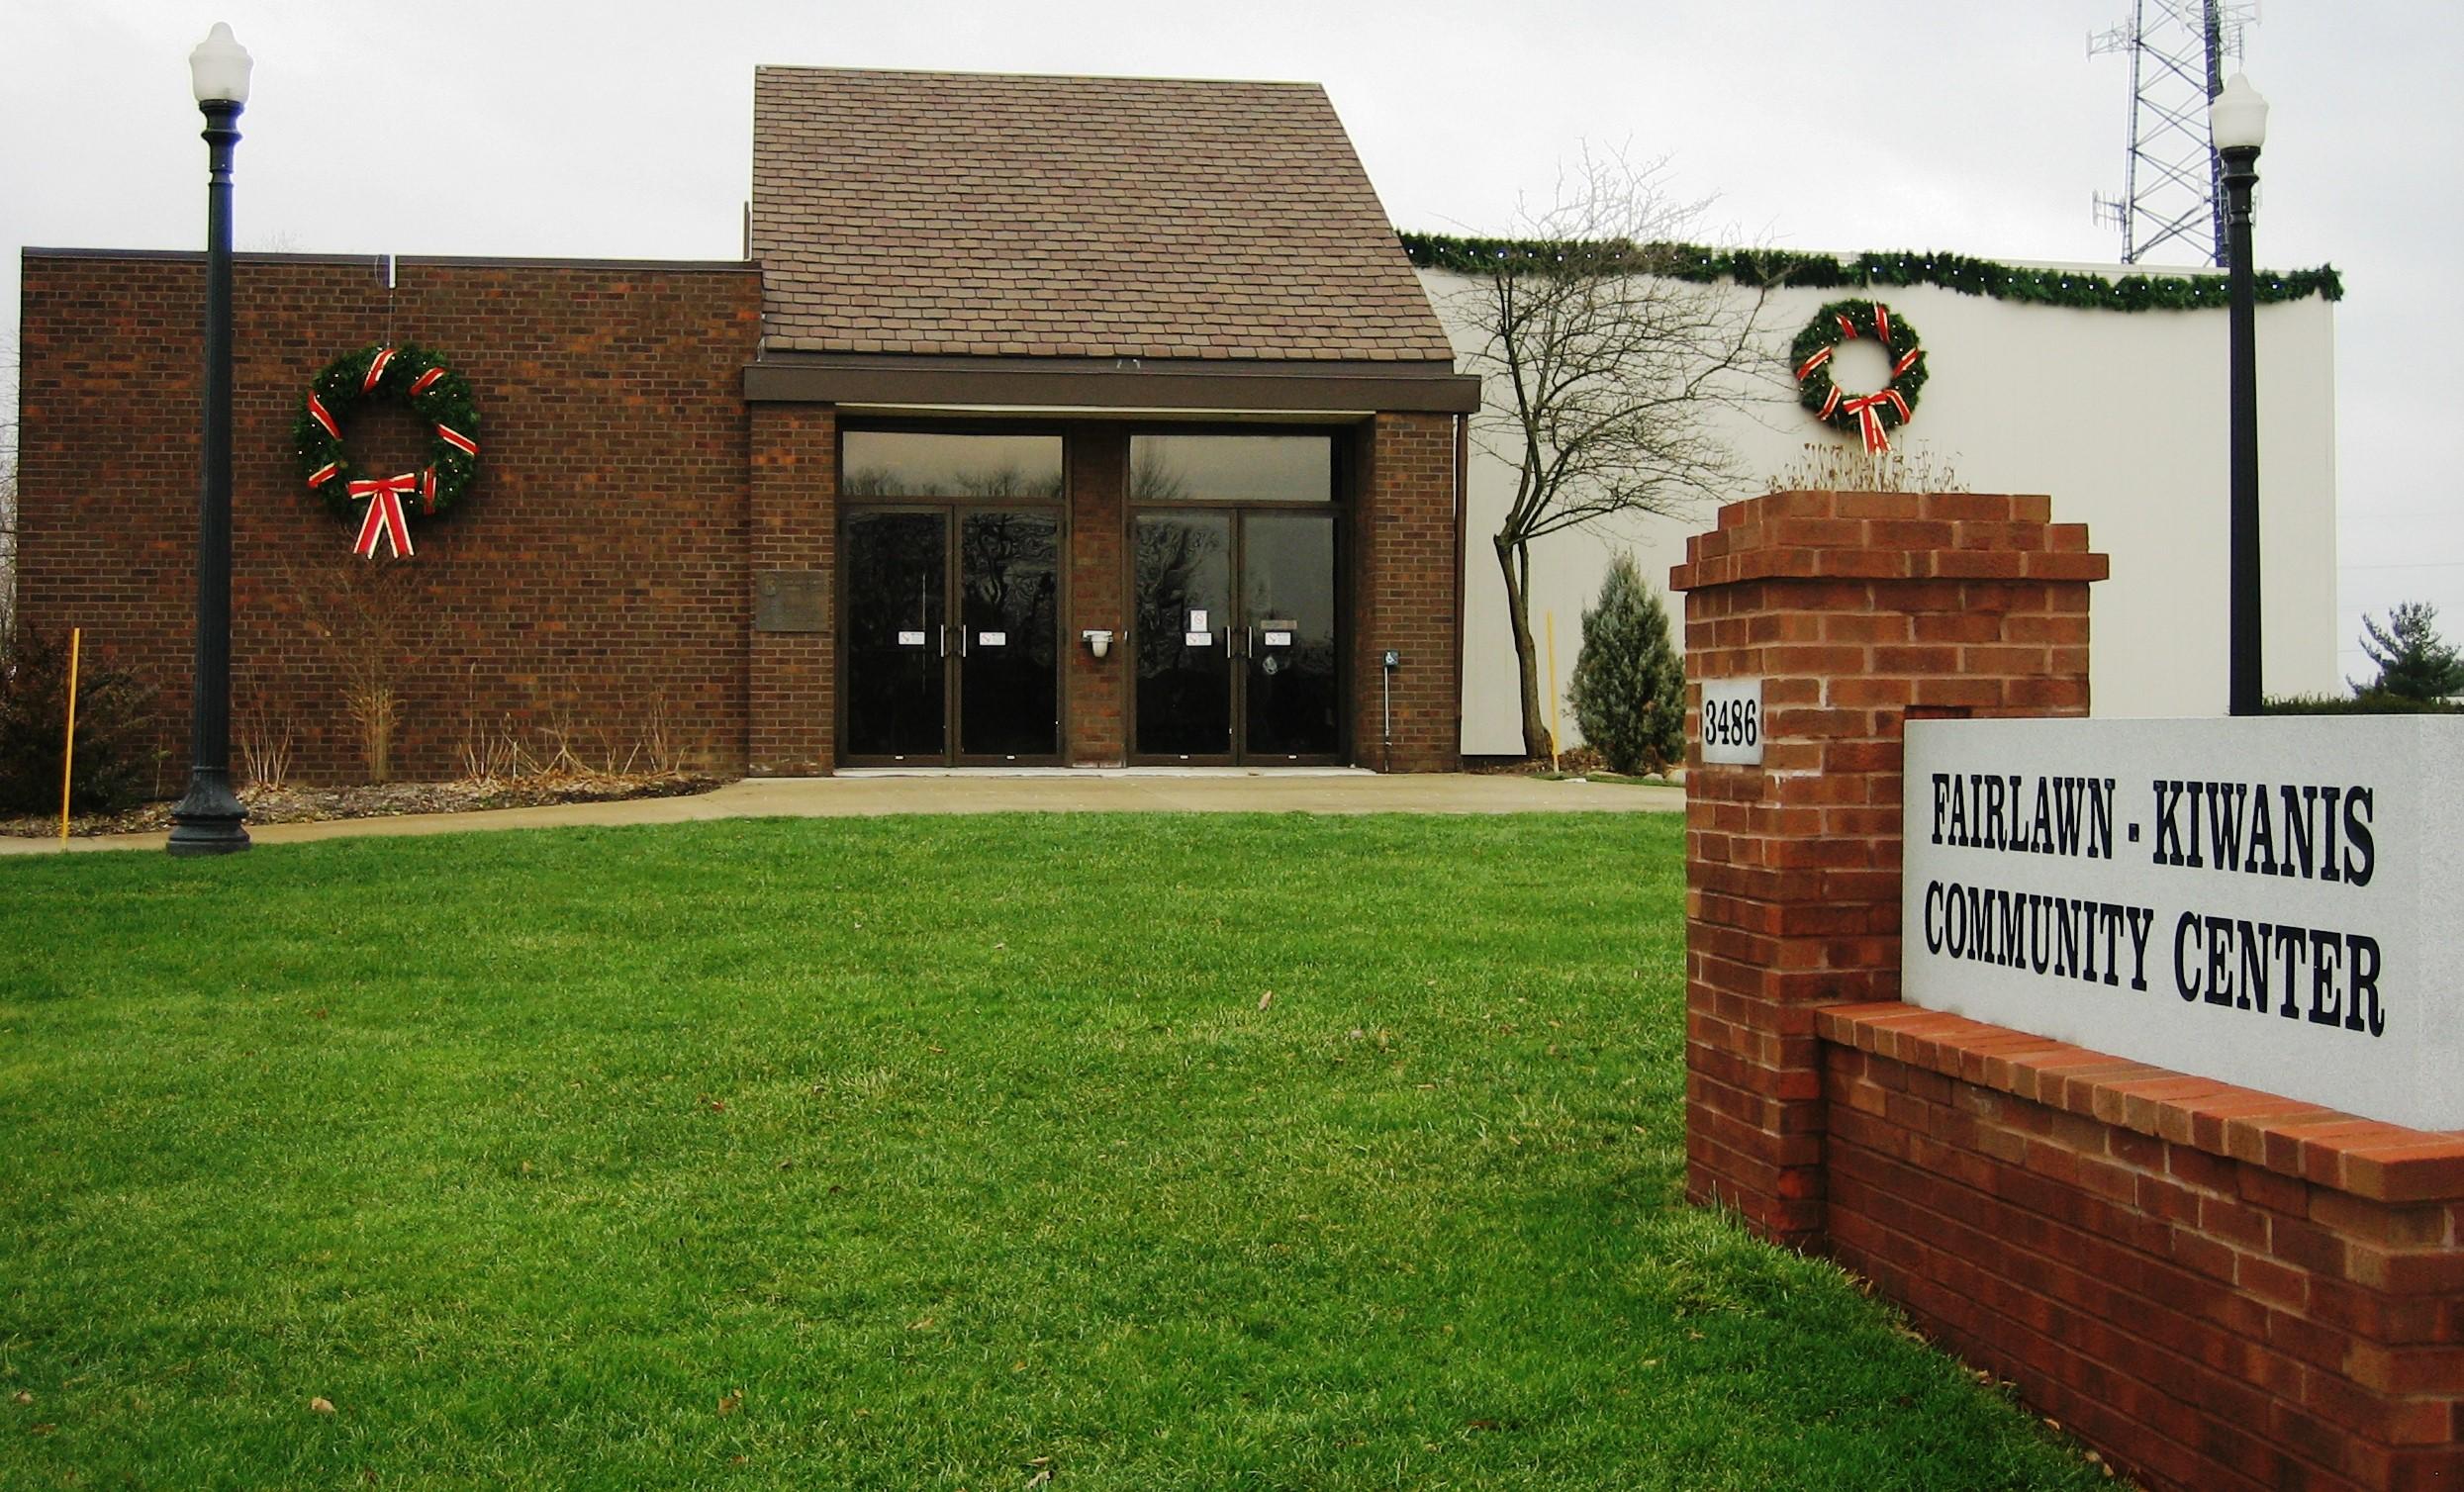 Fairlawn - Kiwanis Community Center